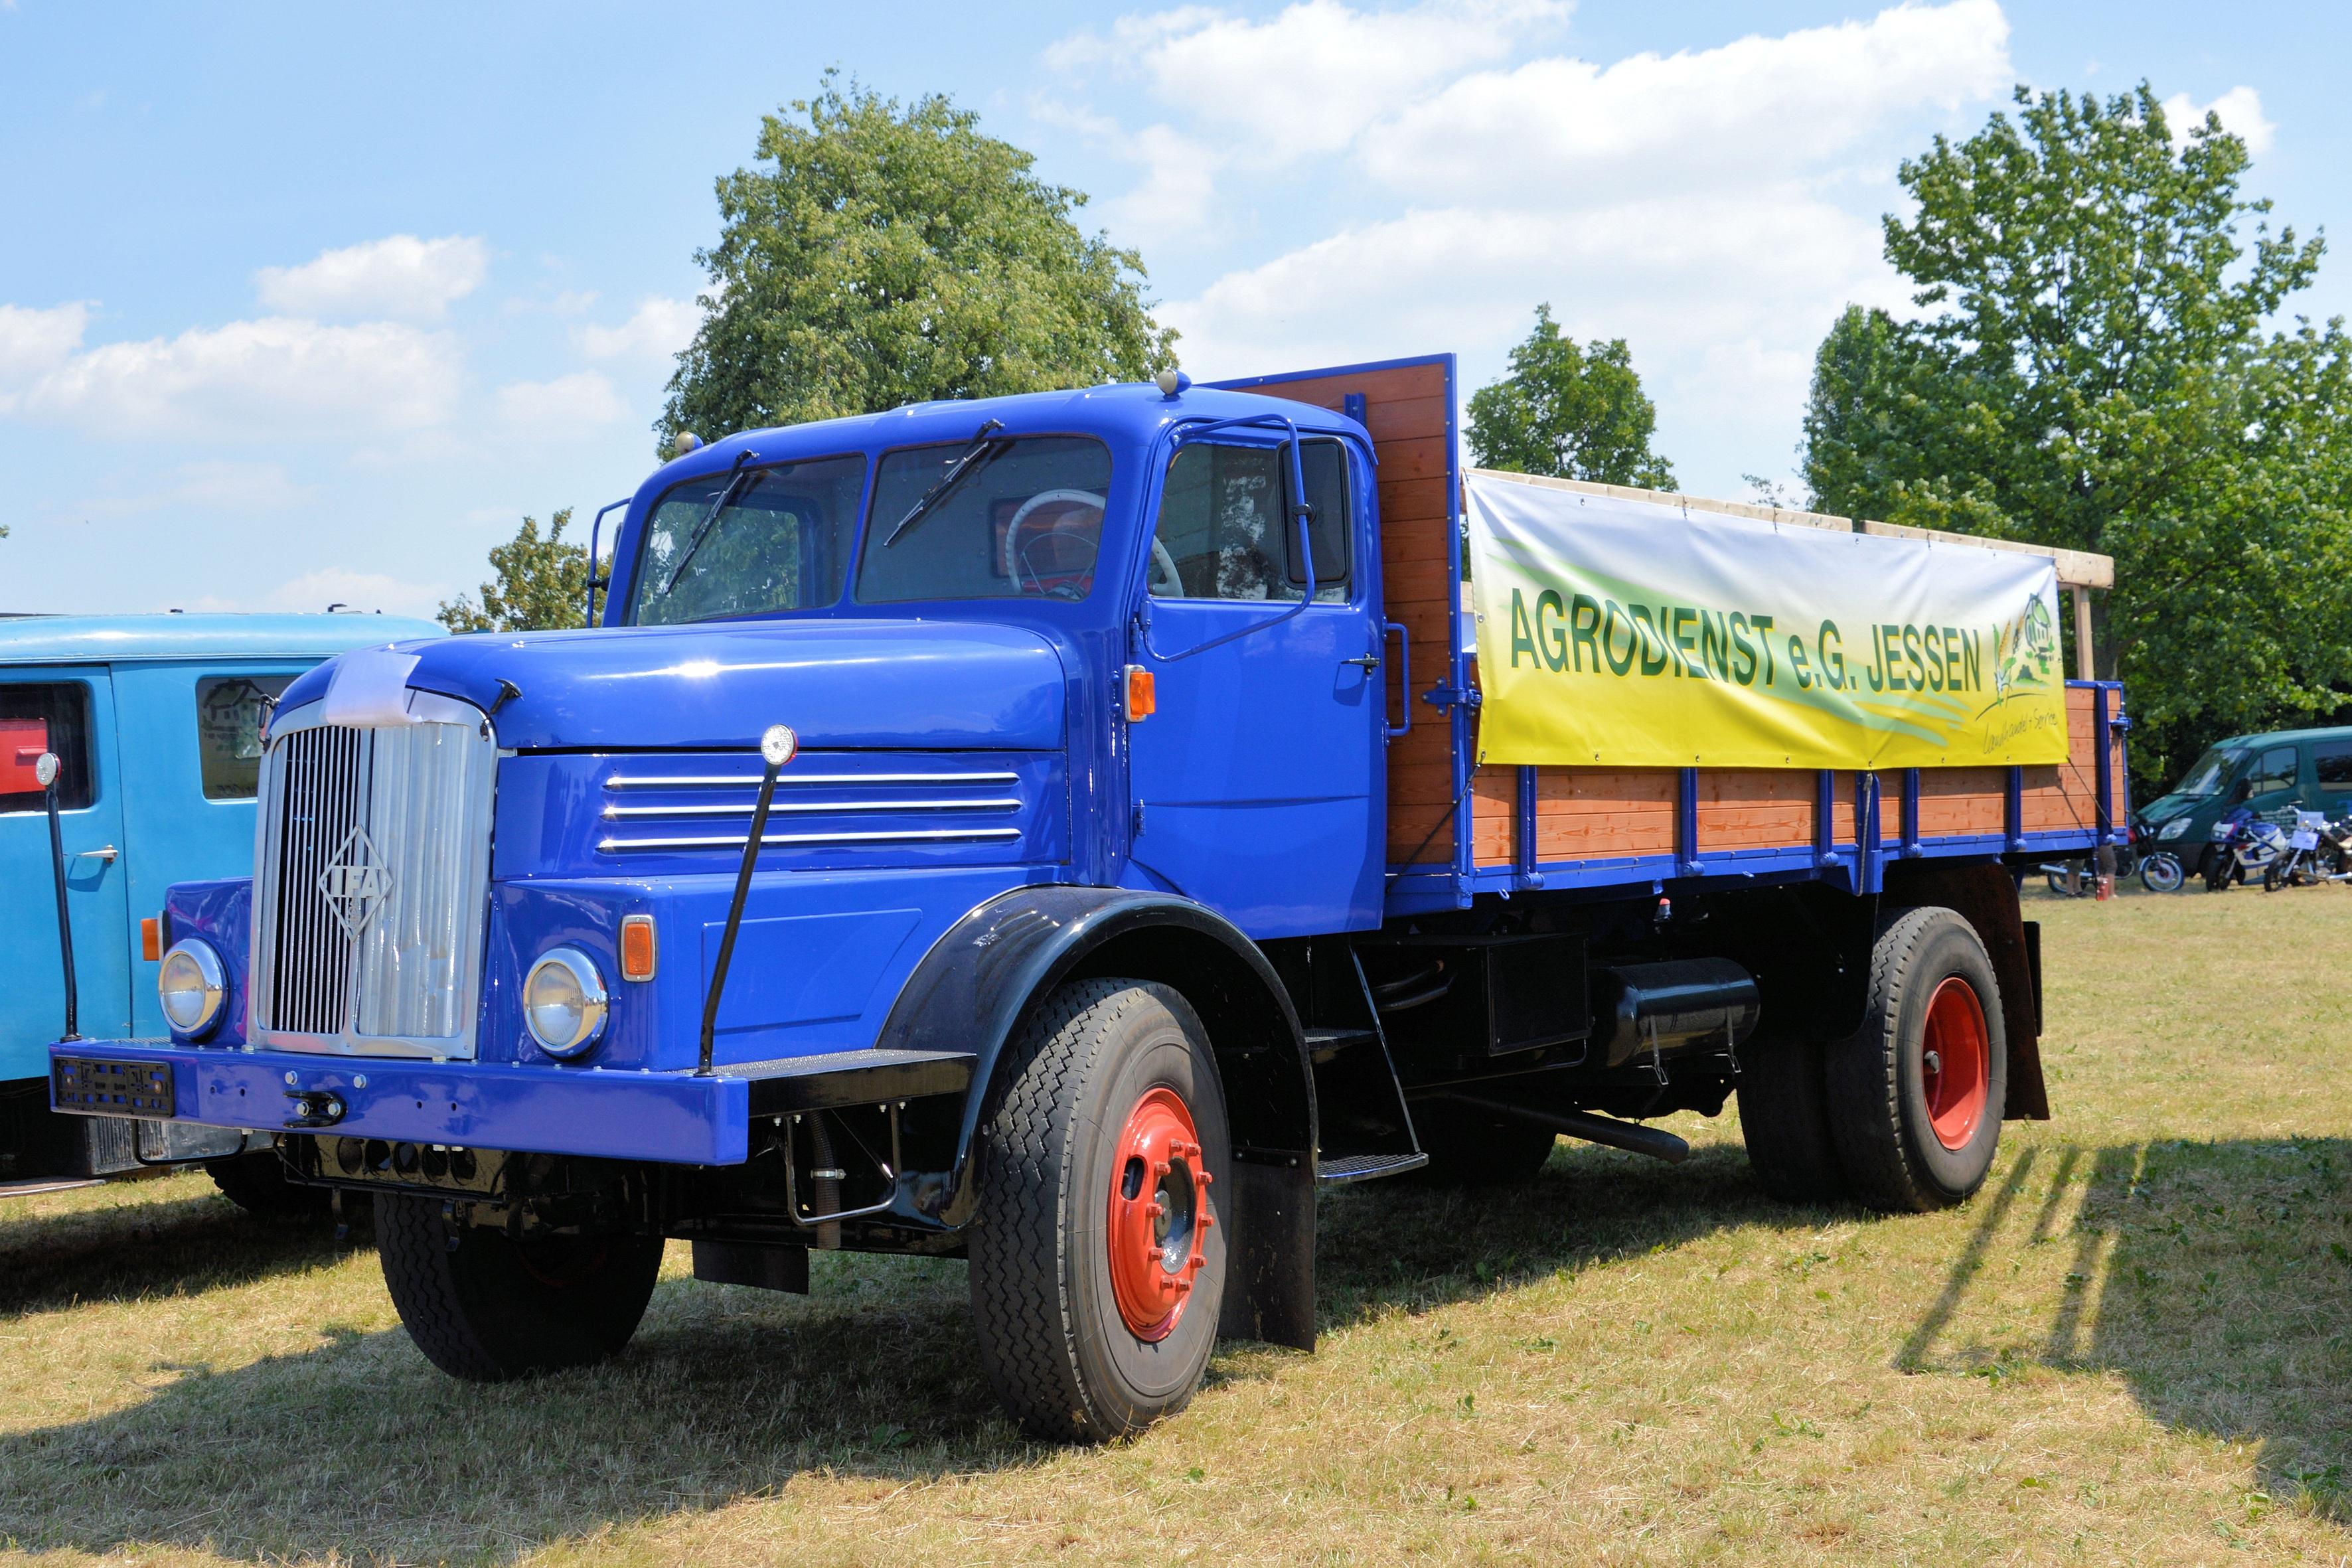 free images transport oldtimer historically vehicles ddr